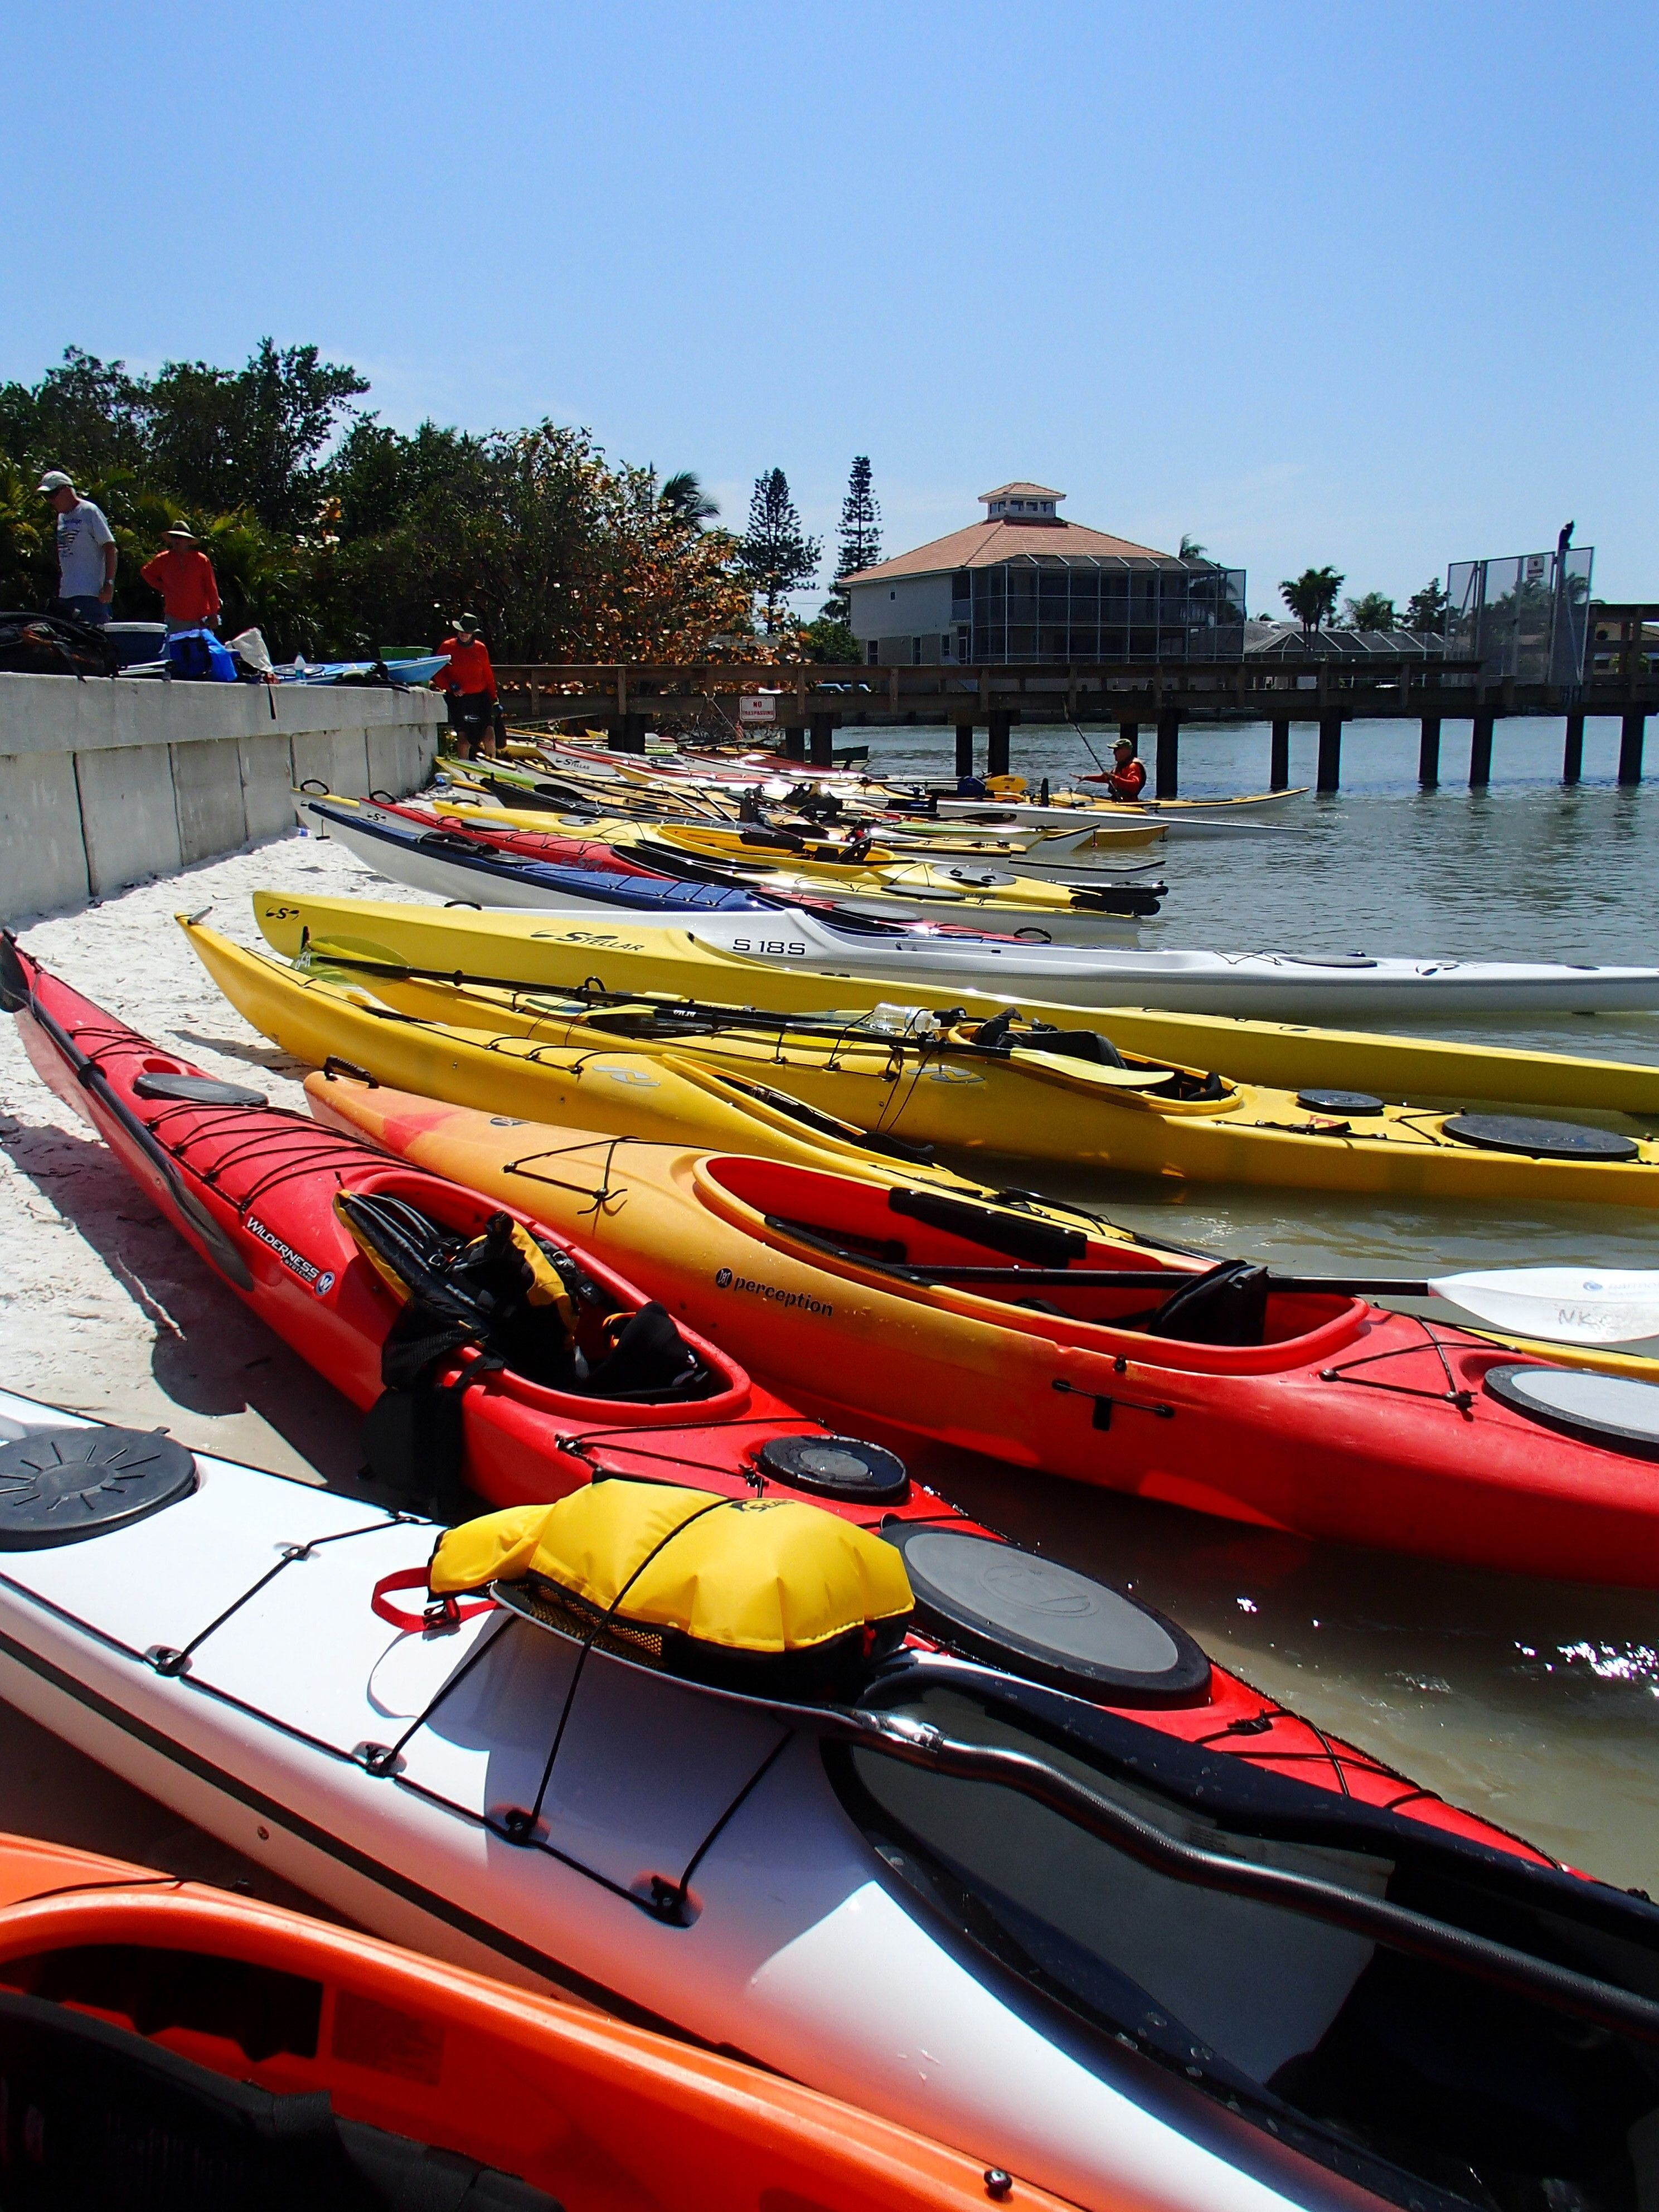 Photos - South Florida Kayaking Meetup (Fort Lauderdale, FL